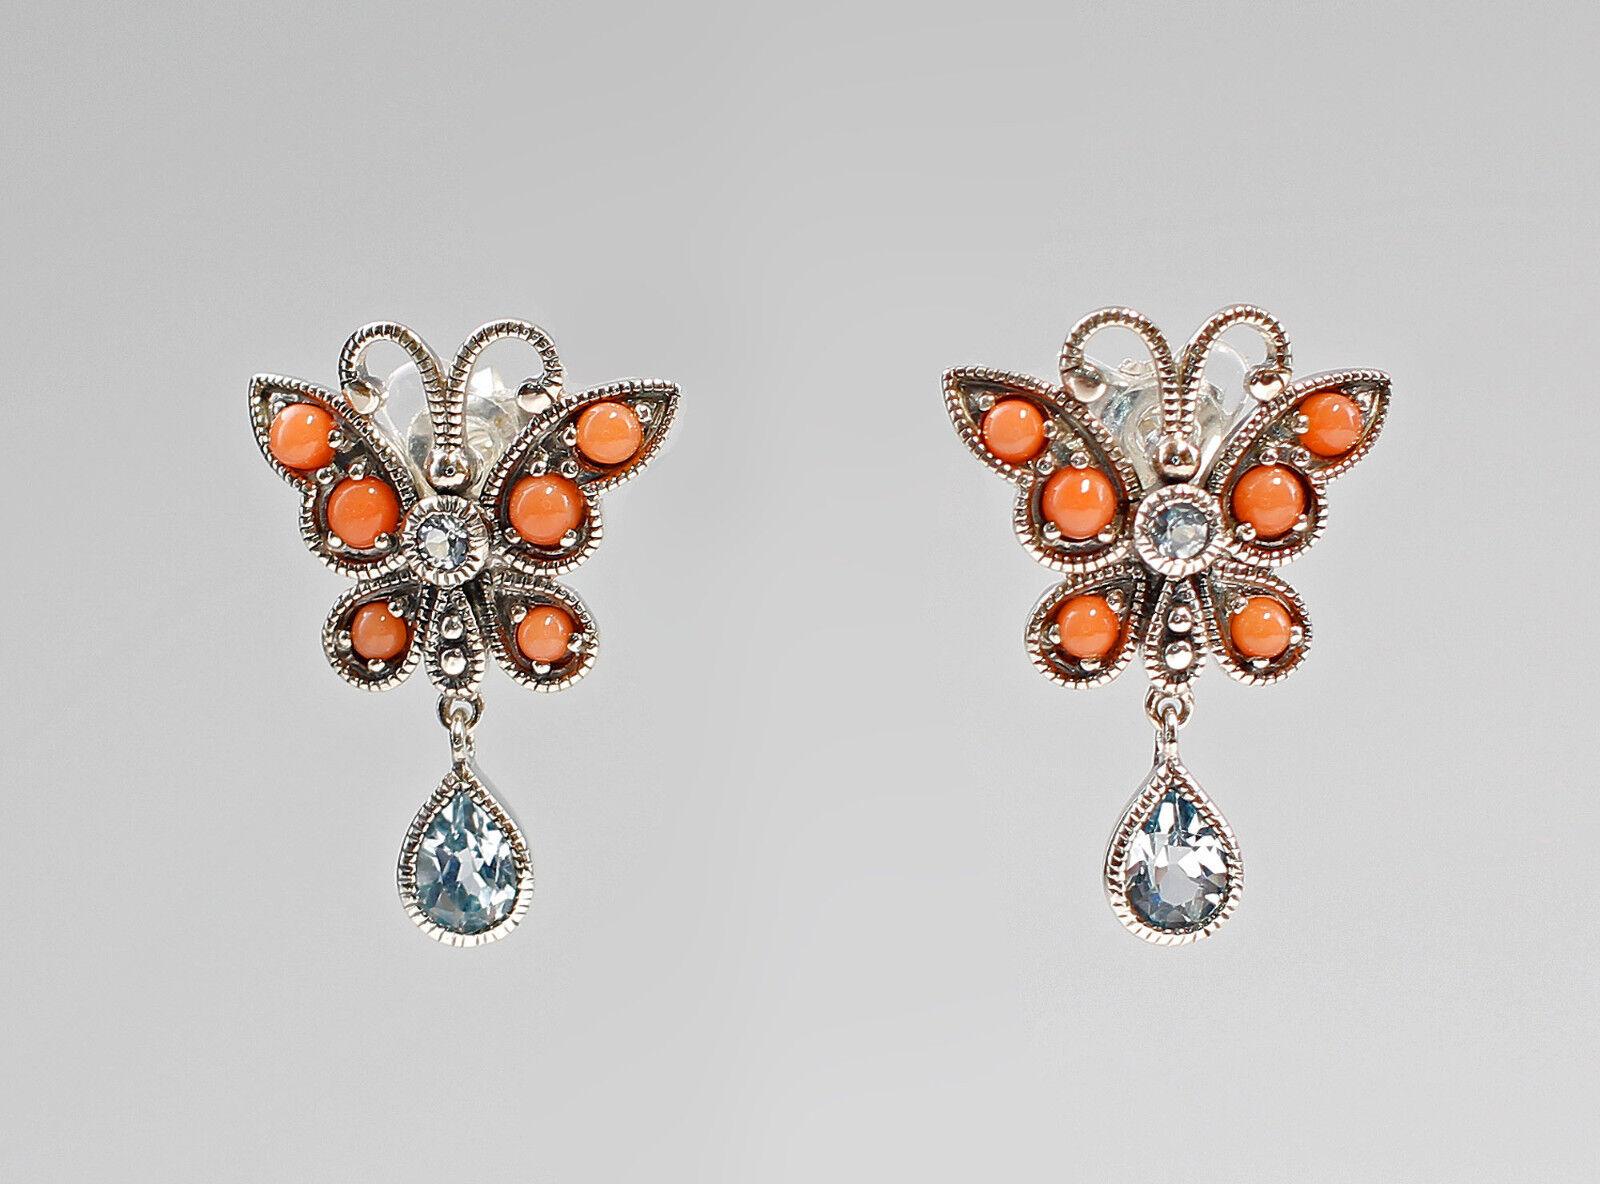 9927240 925 silver Koralle-bluetopas-Ohrringe Style Antique Papillon